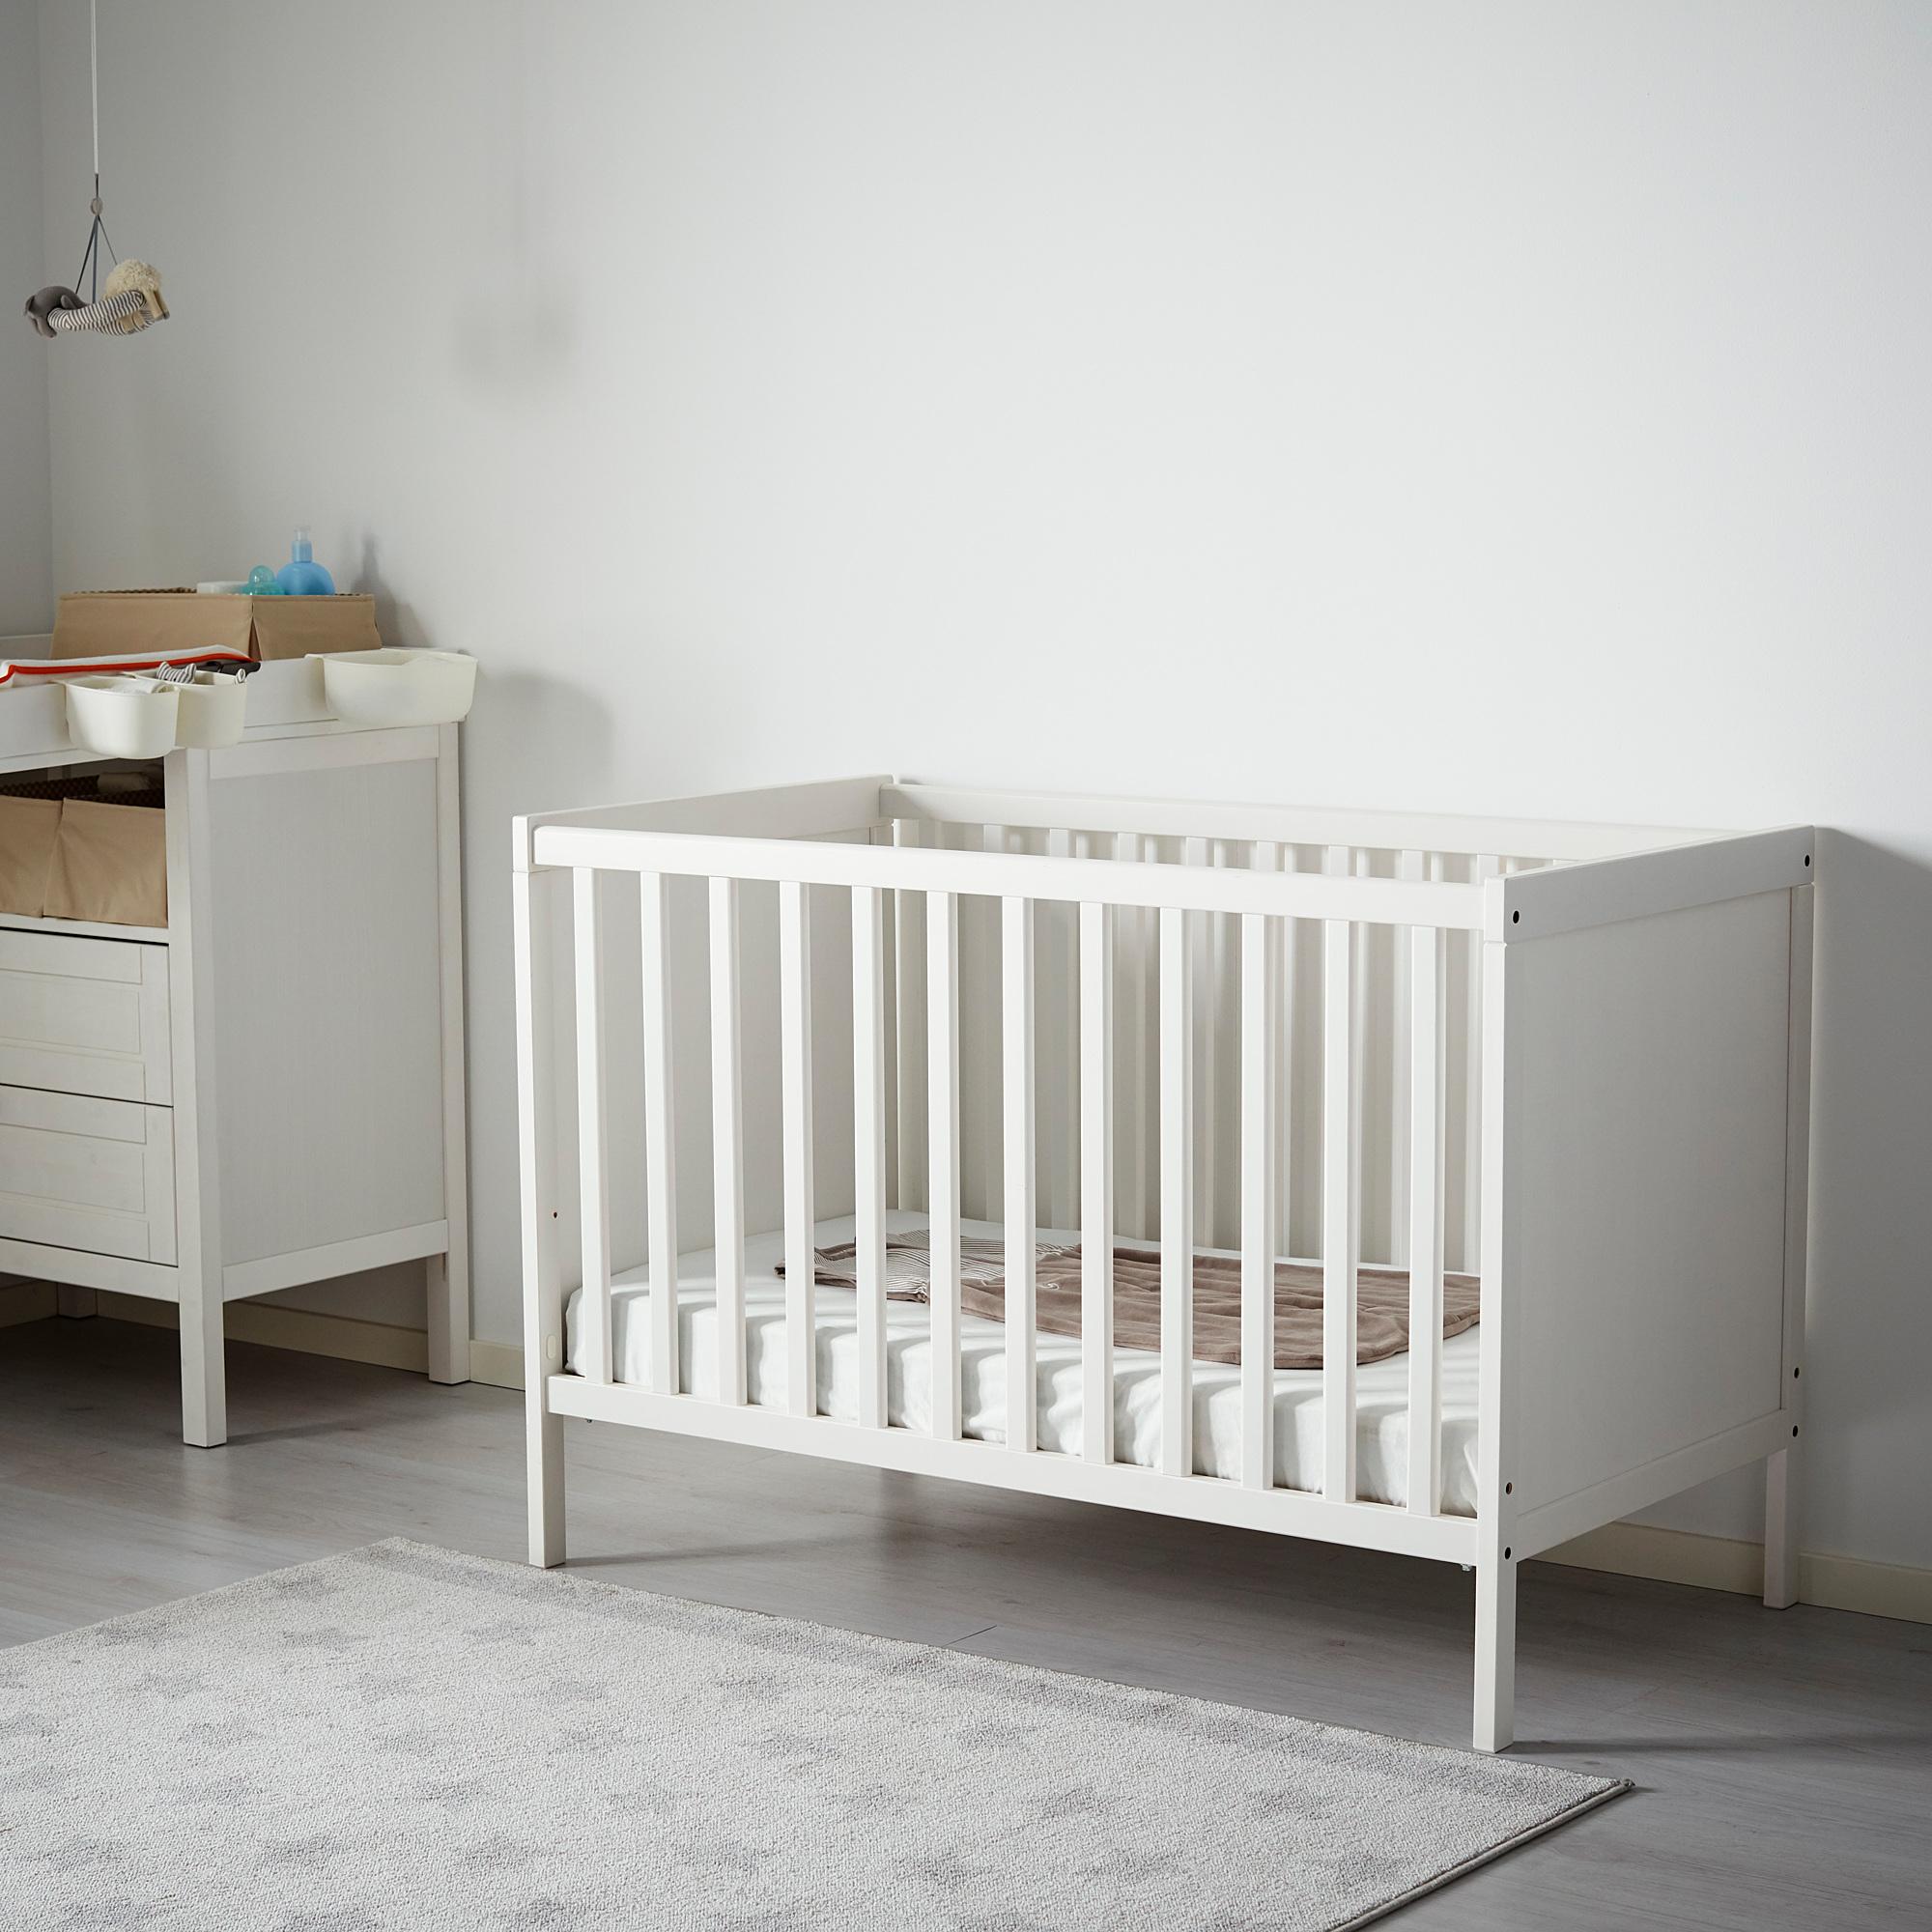 Sundvik Ranjang Bayi Putih Ikea Indonesia